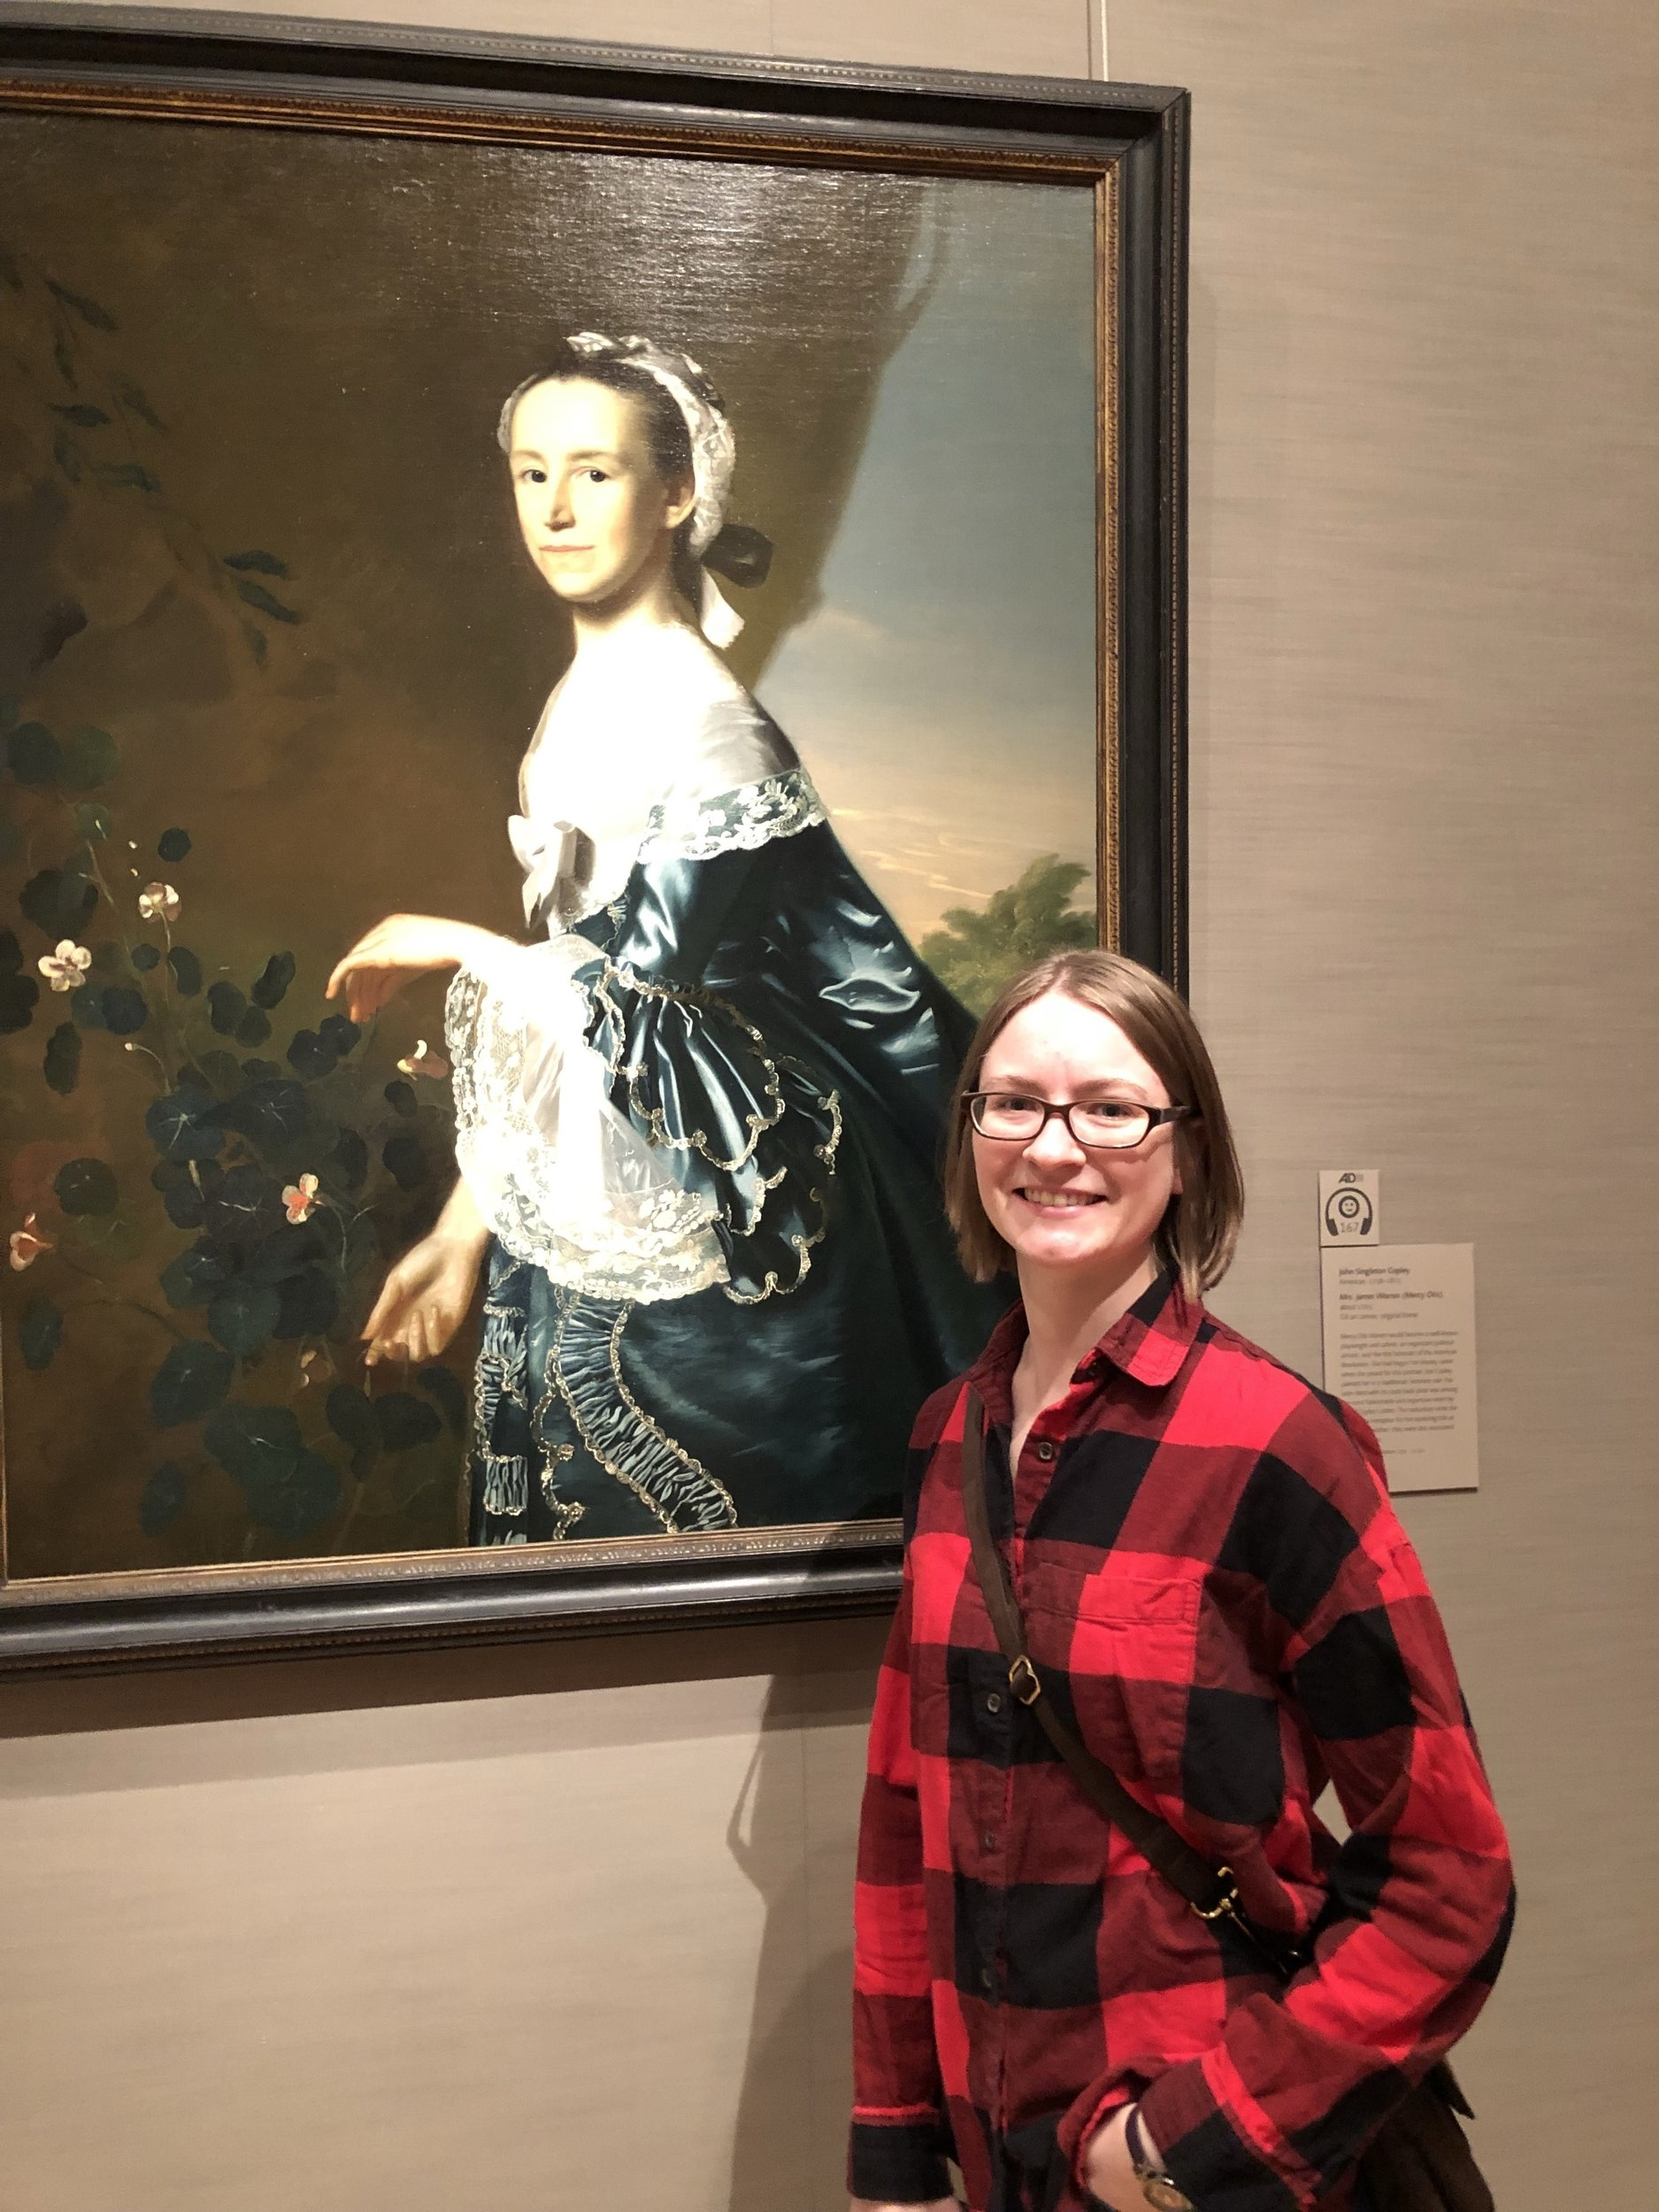 Robin with Copley's portrait of Mercy Otis Warren at the MFA. Photo: Jim Donovan